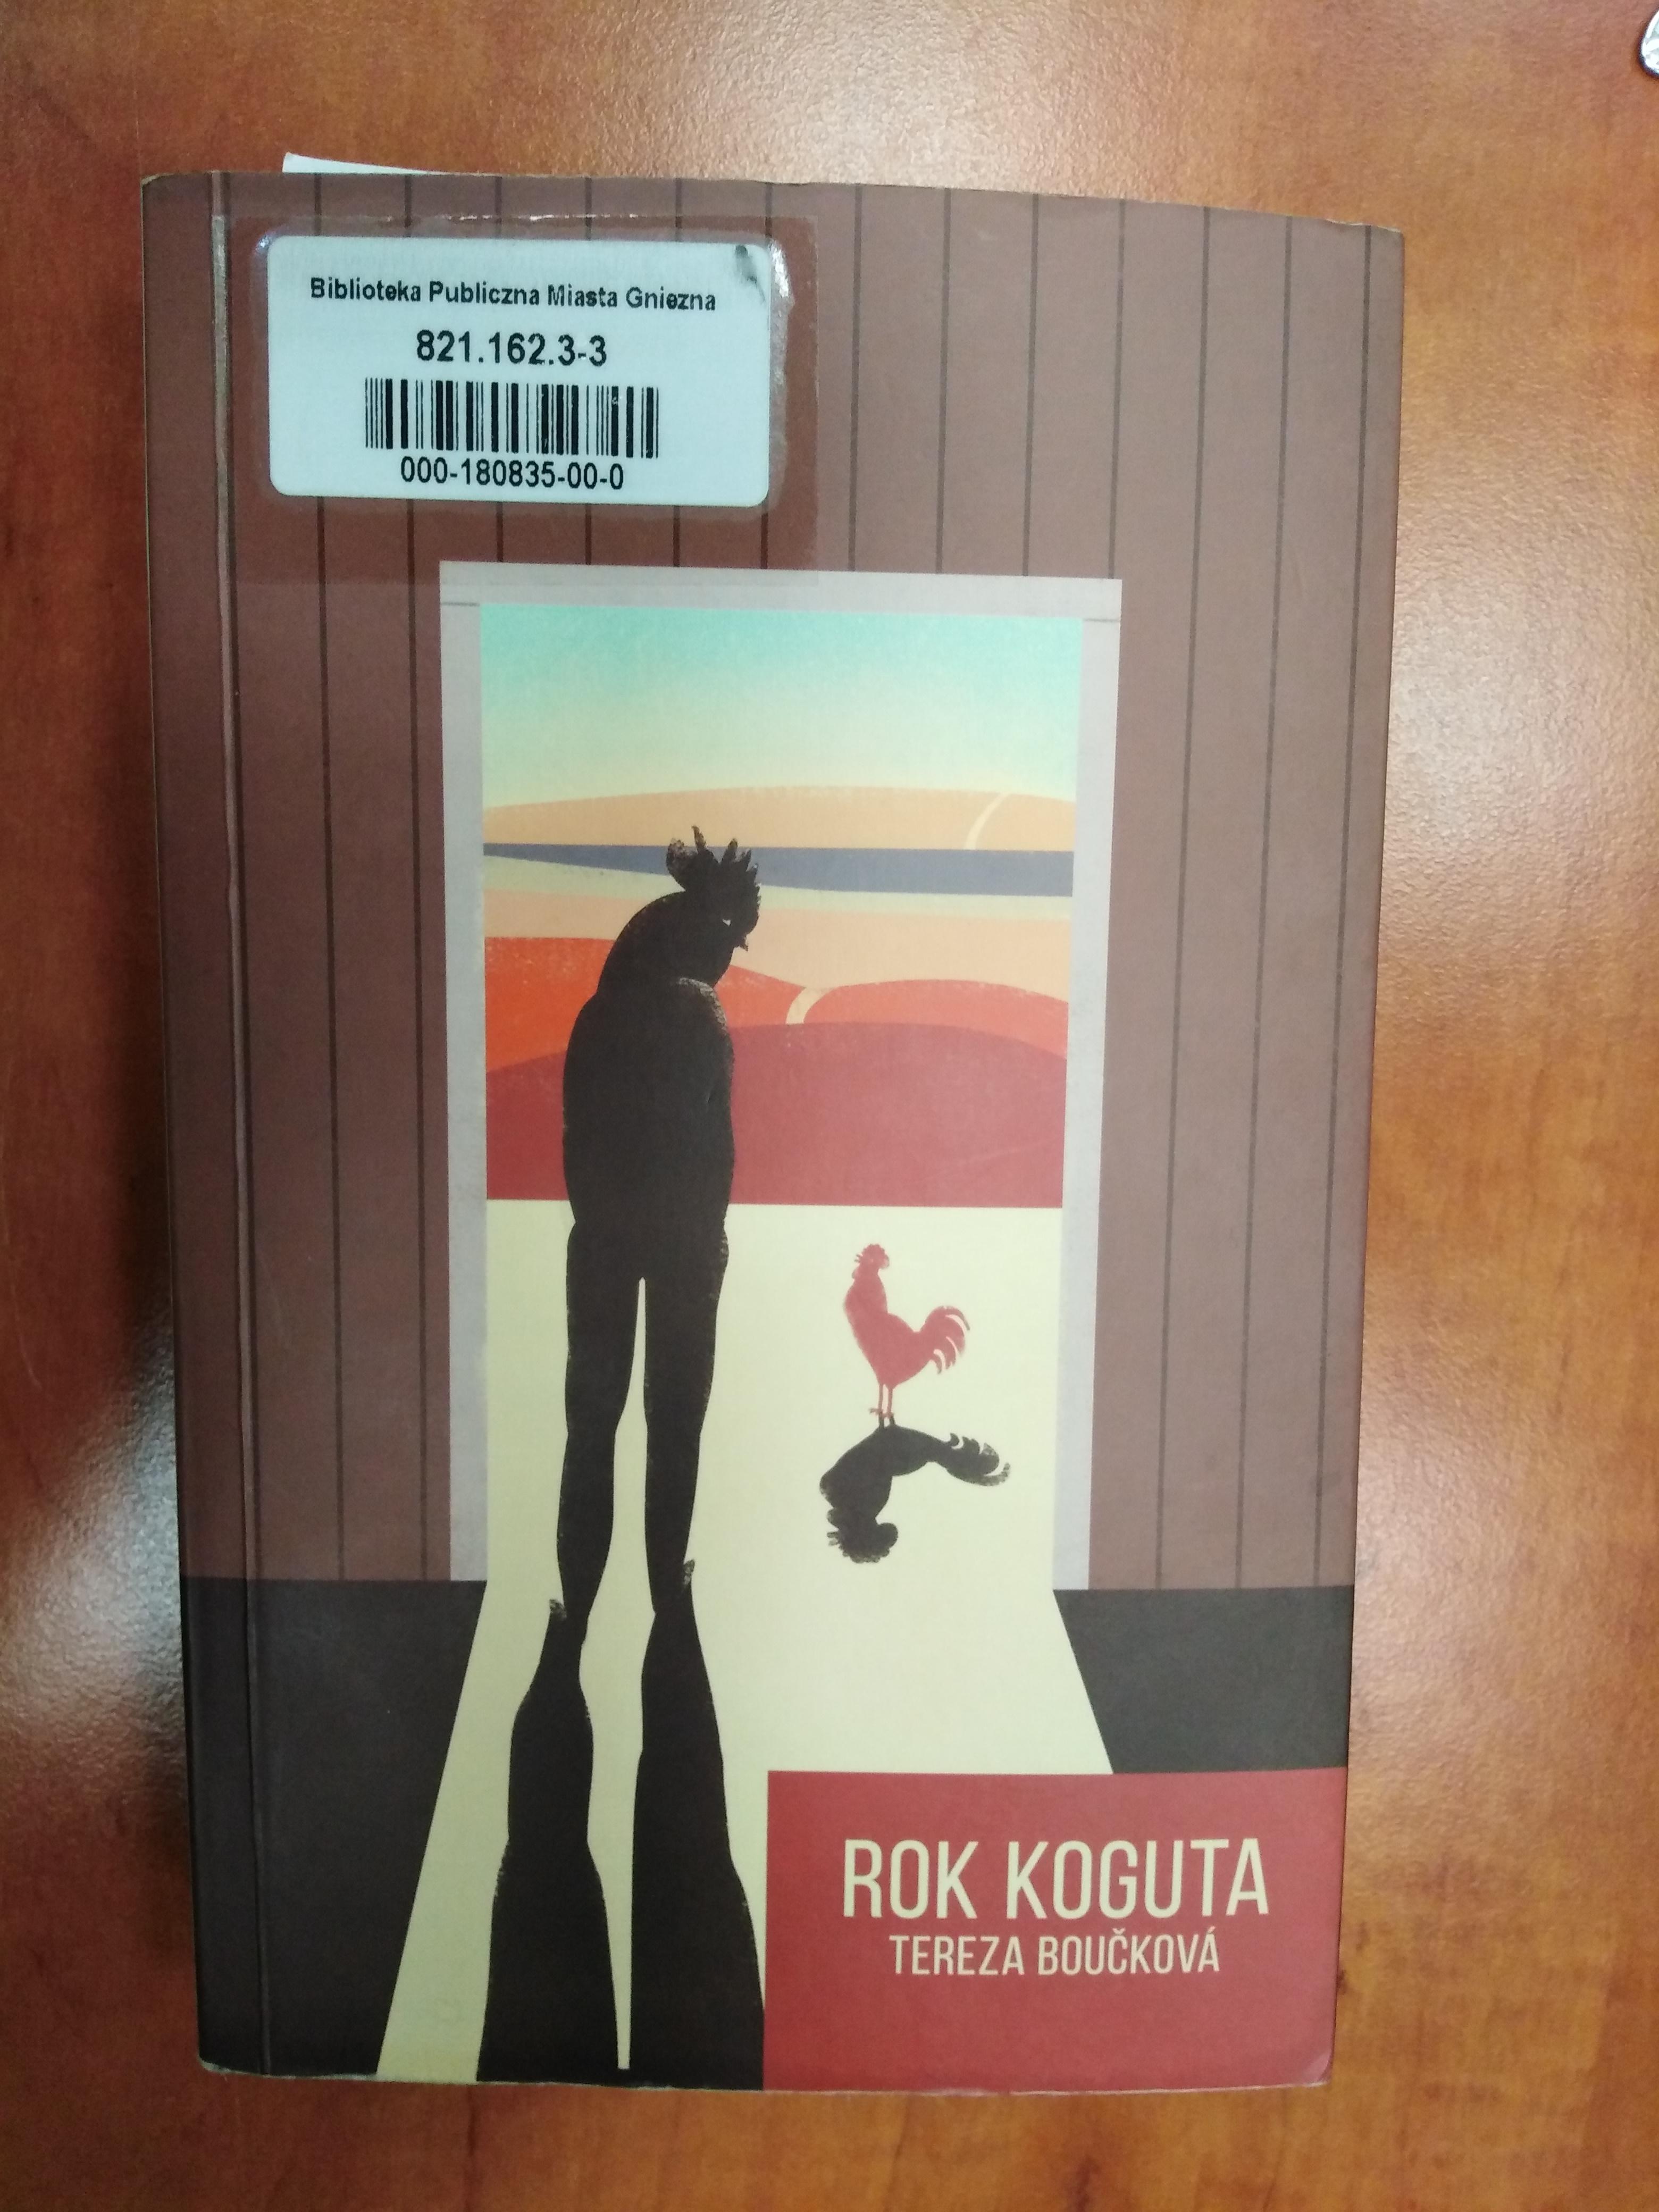 "Ostatni rok rodziny w książce ""Rok koguta"" Teresy Bouckovej"